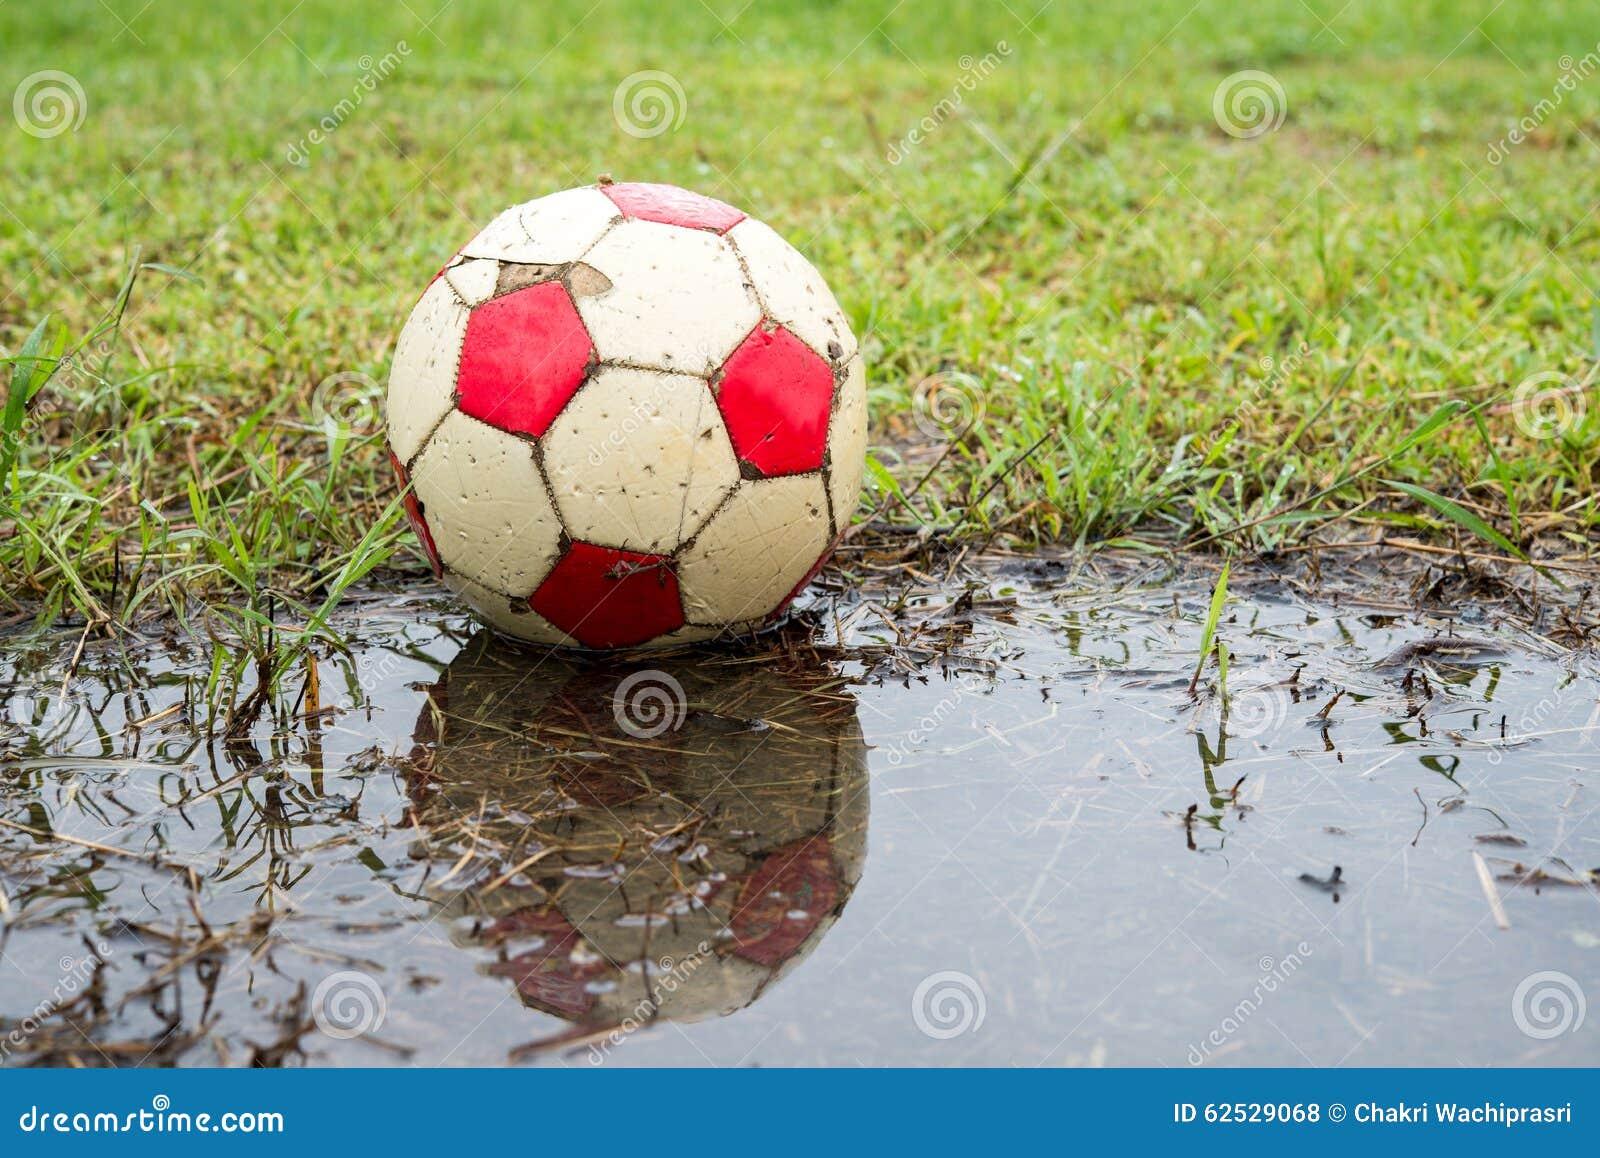 Classic ball football on grass